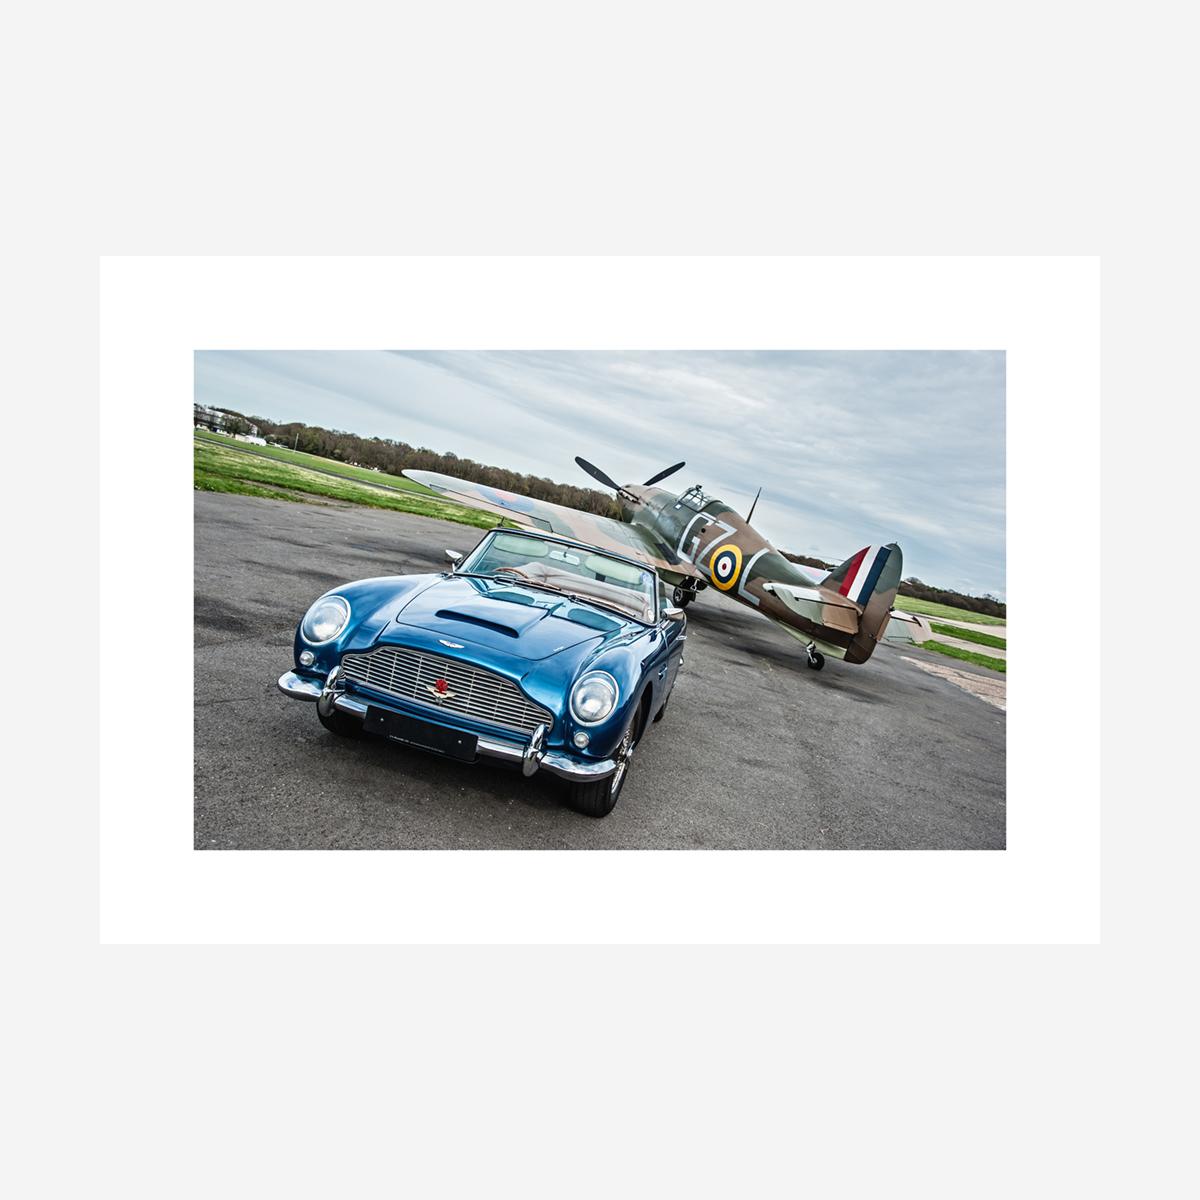 Aston Martin DB5 & Hawker Hurricane - 32x22.jpg